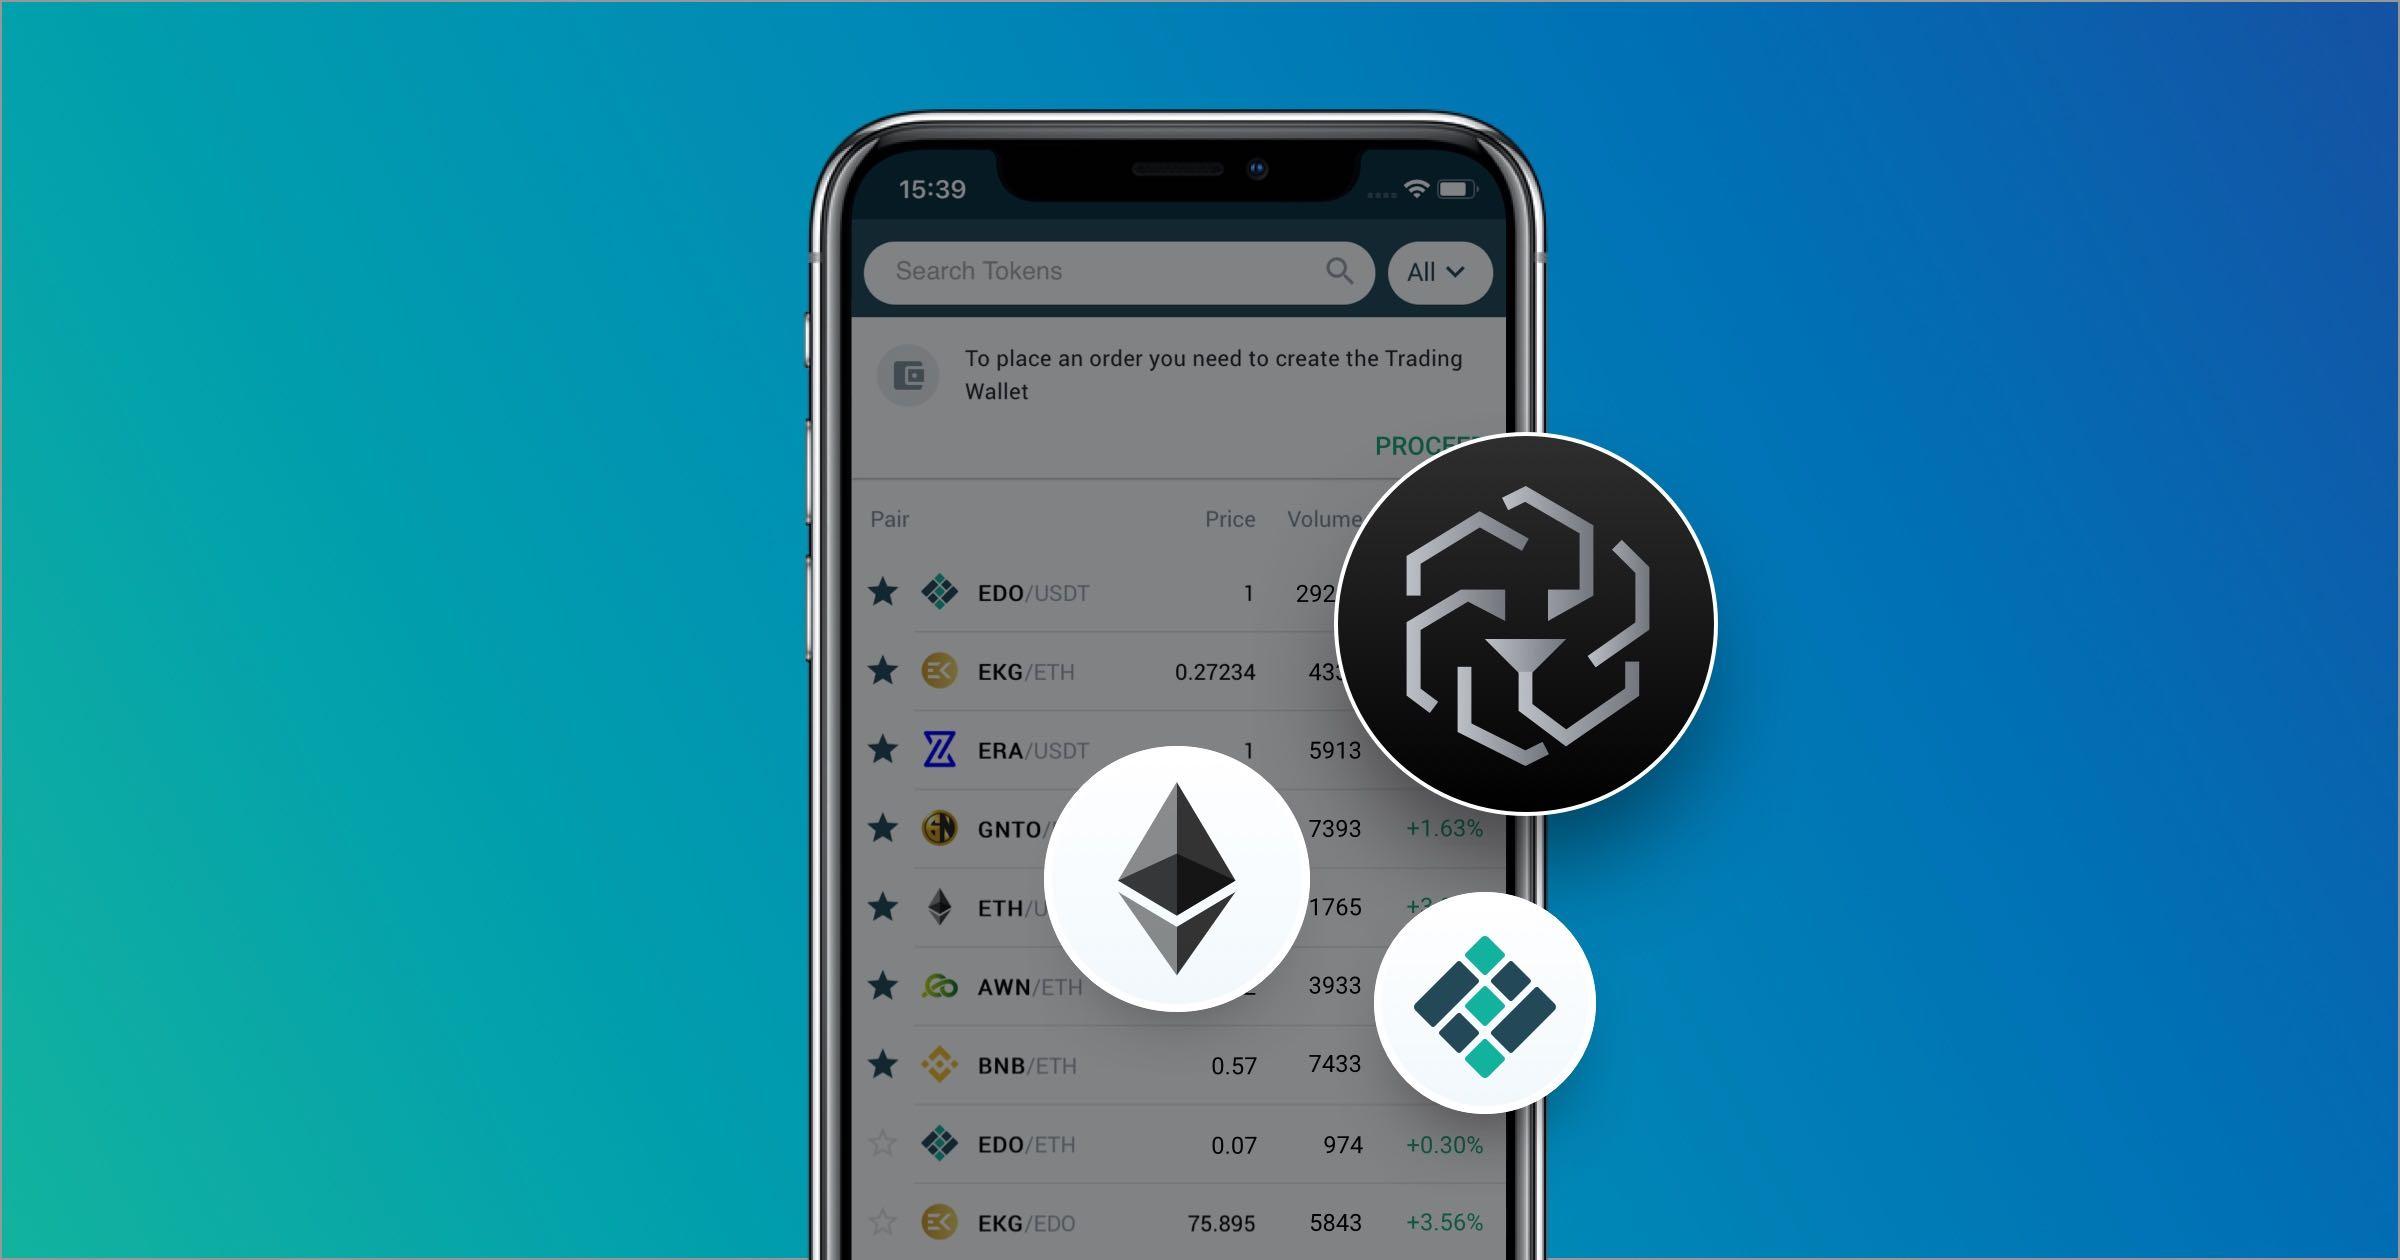 Acquistare i token LEO di Bitfinex su Eidoo - Acquistare i token LEO di Bitfinex su Eidoo